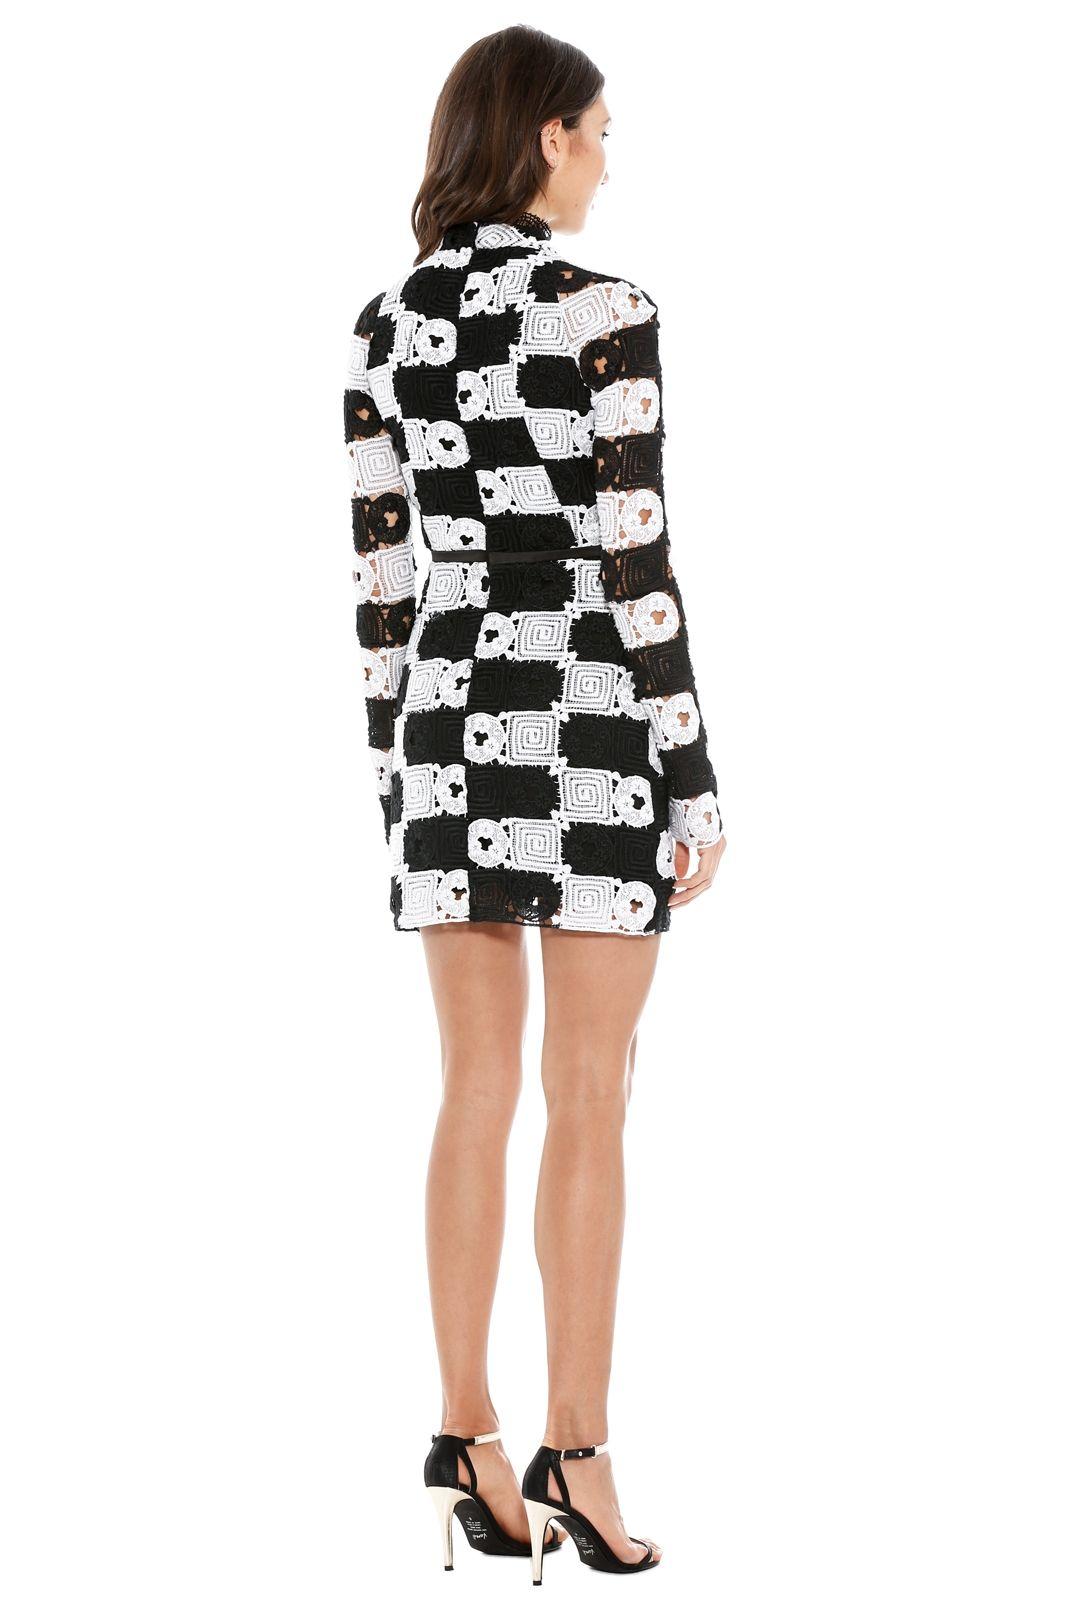 Manning Cartell - Split Personality Dress - Back White - Back